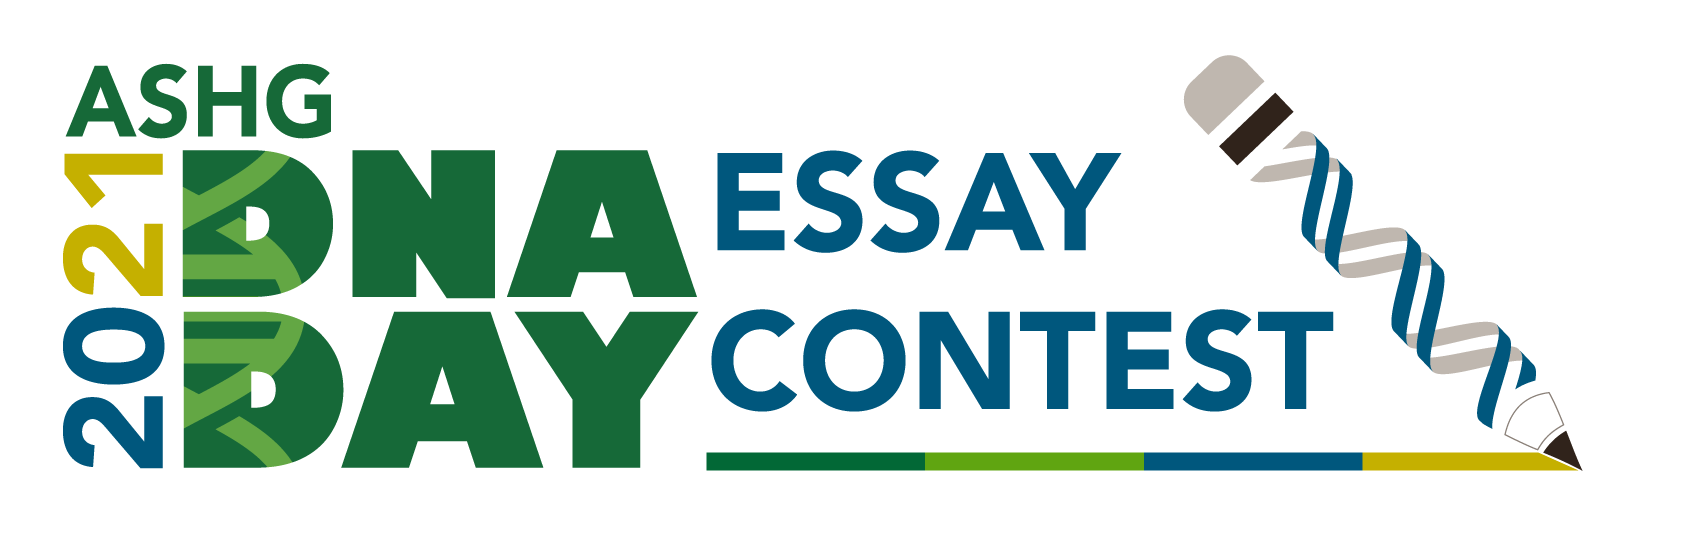 2021 ASHG DNA Day Essay Contest Logo